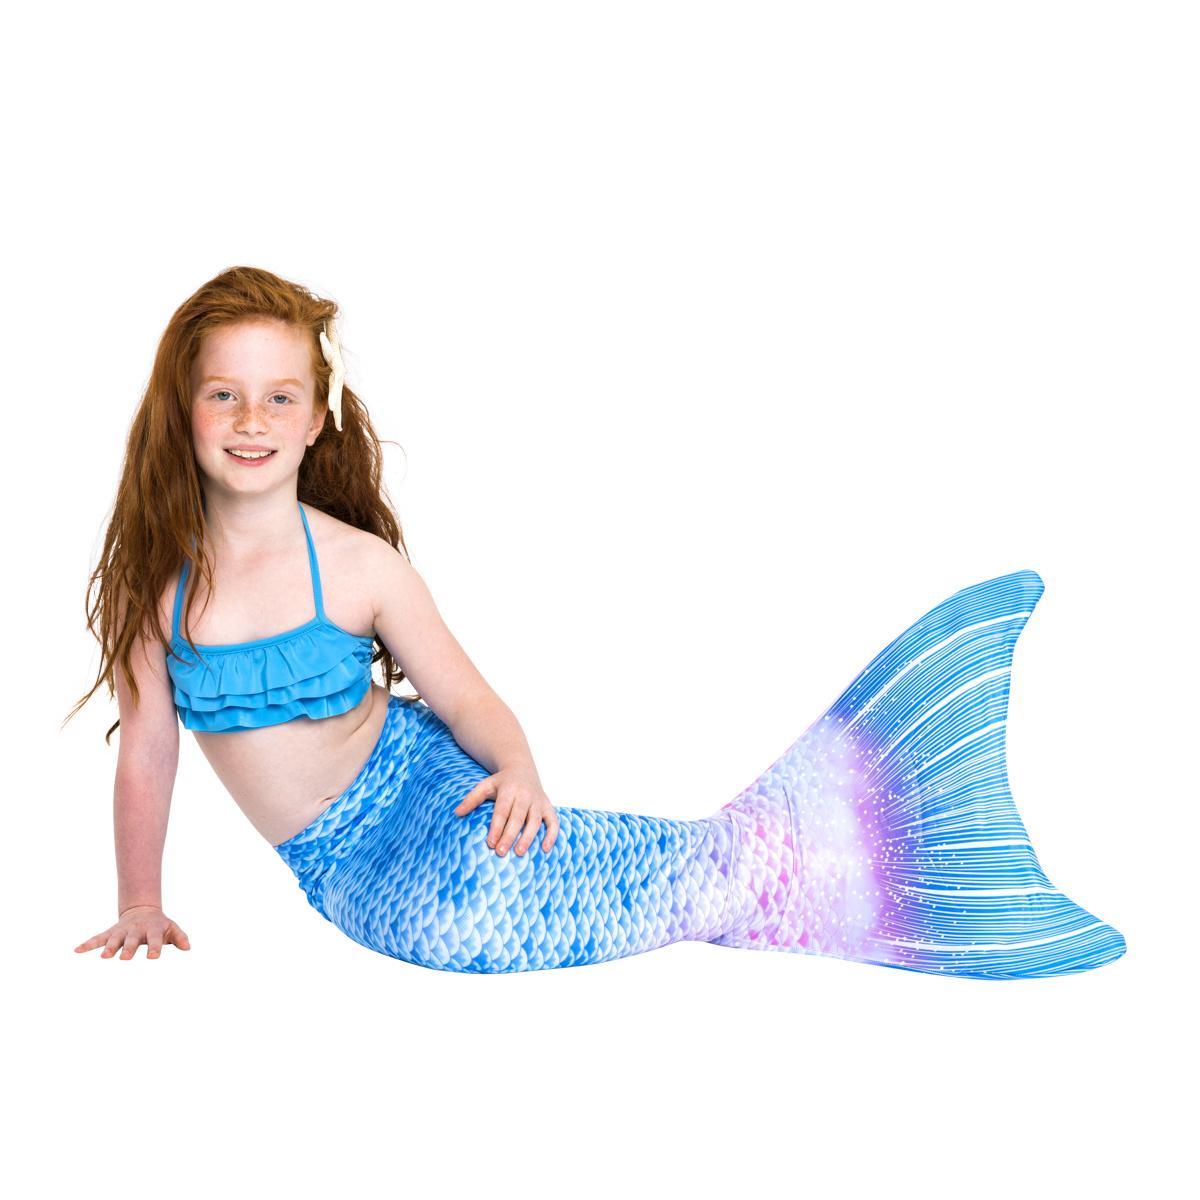 NoordZeemeermin Blue fantasy mermaid tail